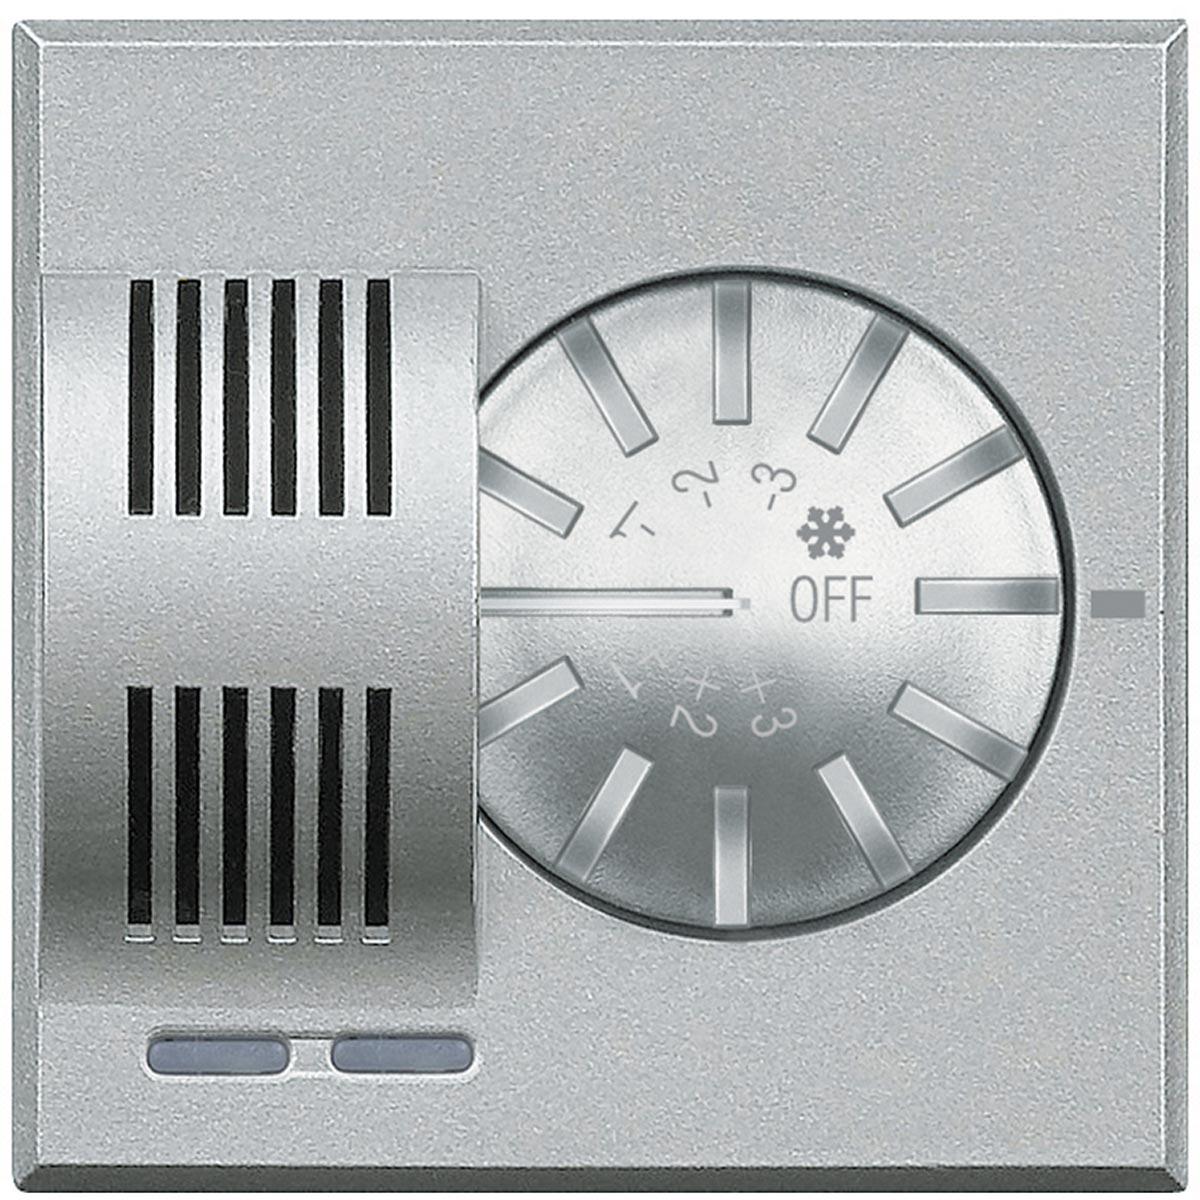 HC4692 axolute bticino termostato ambiente chiara